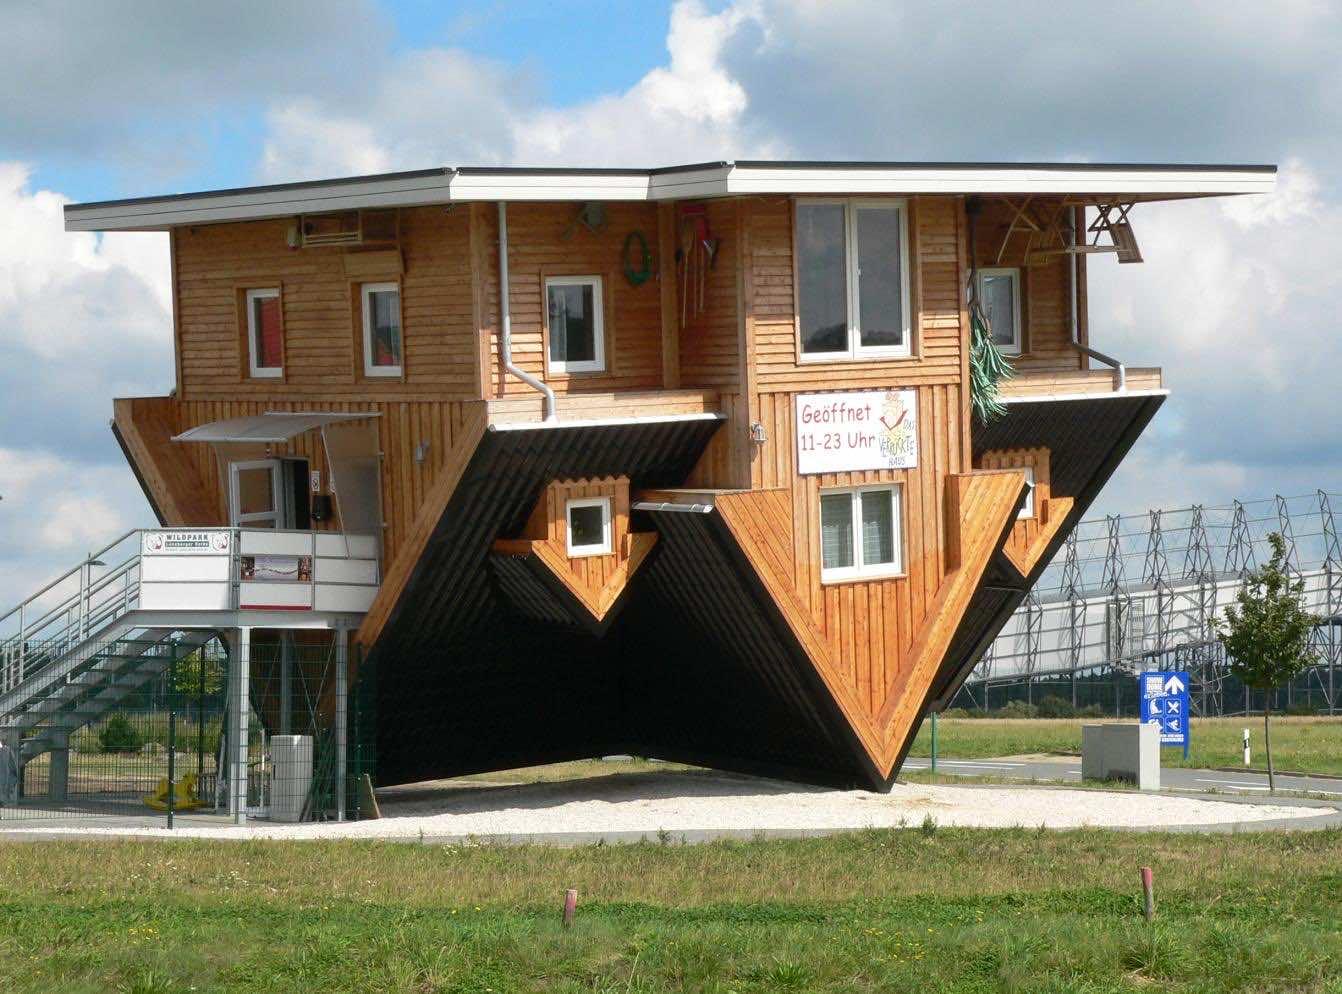 upside_down_house_Germany (1)